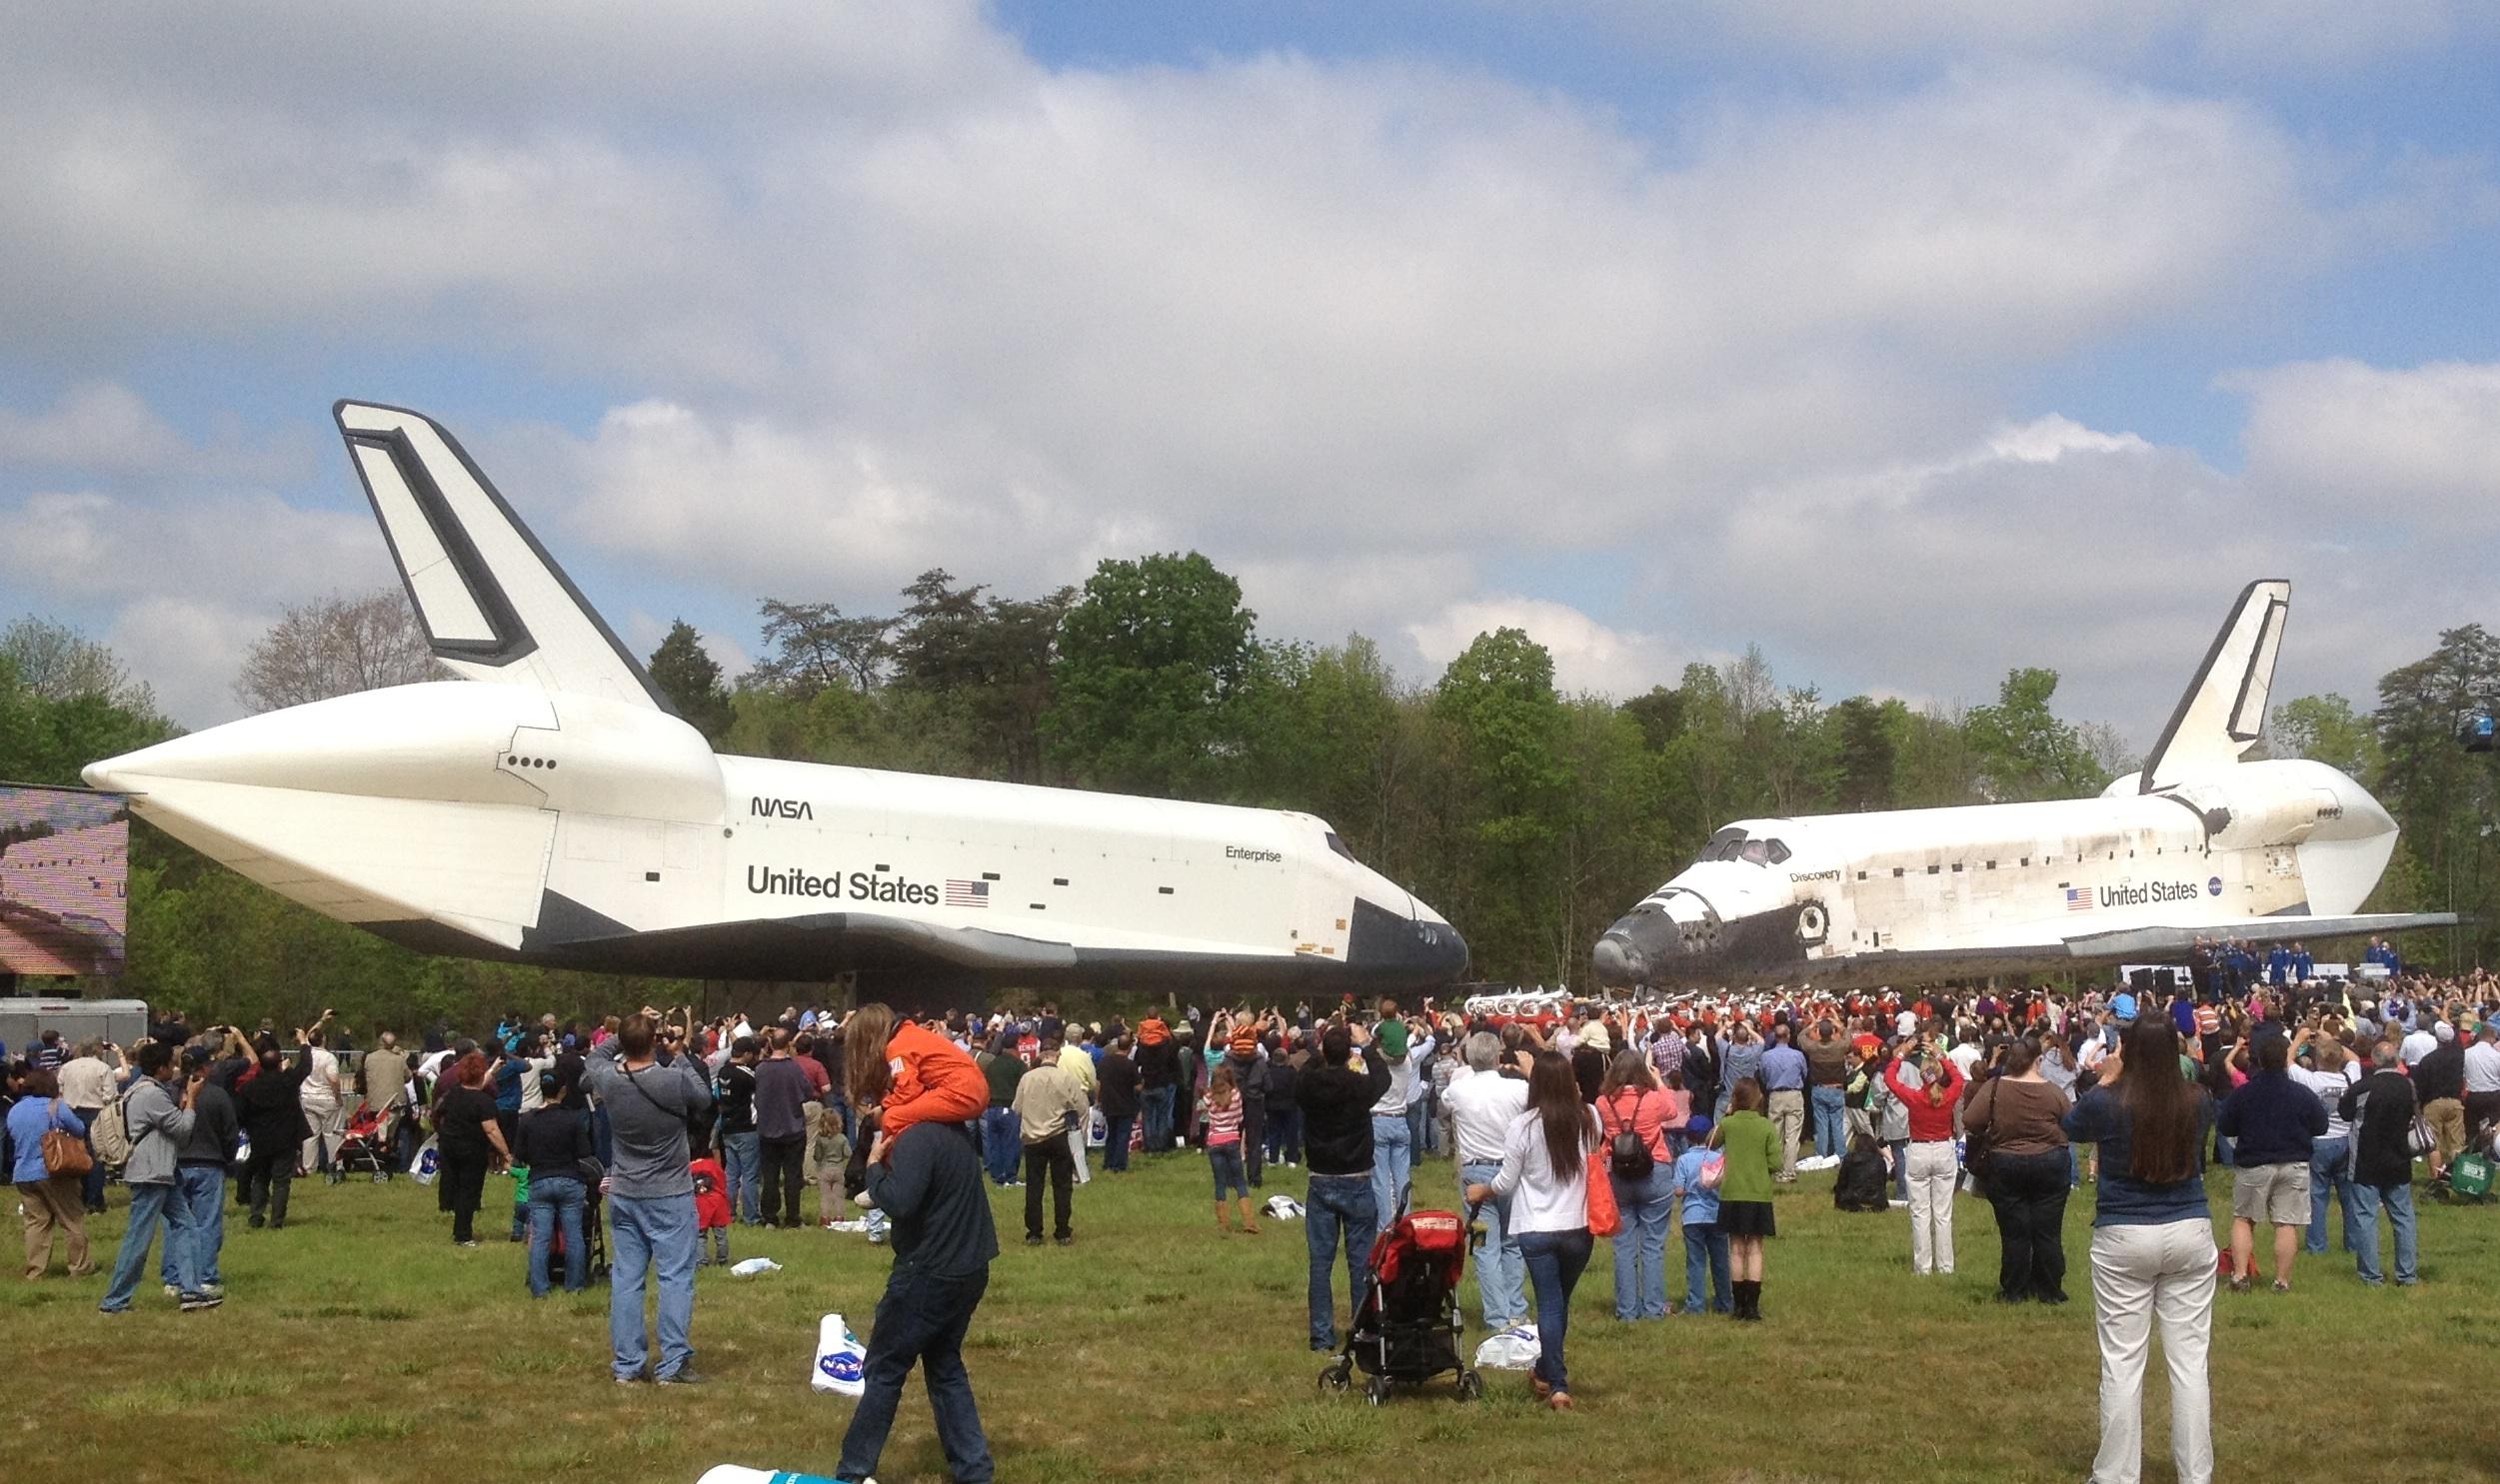 NASA - Shuttle Discovery Transferred to NASM's Udvar-Hazy ...